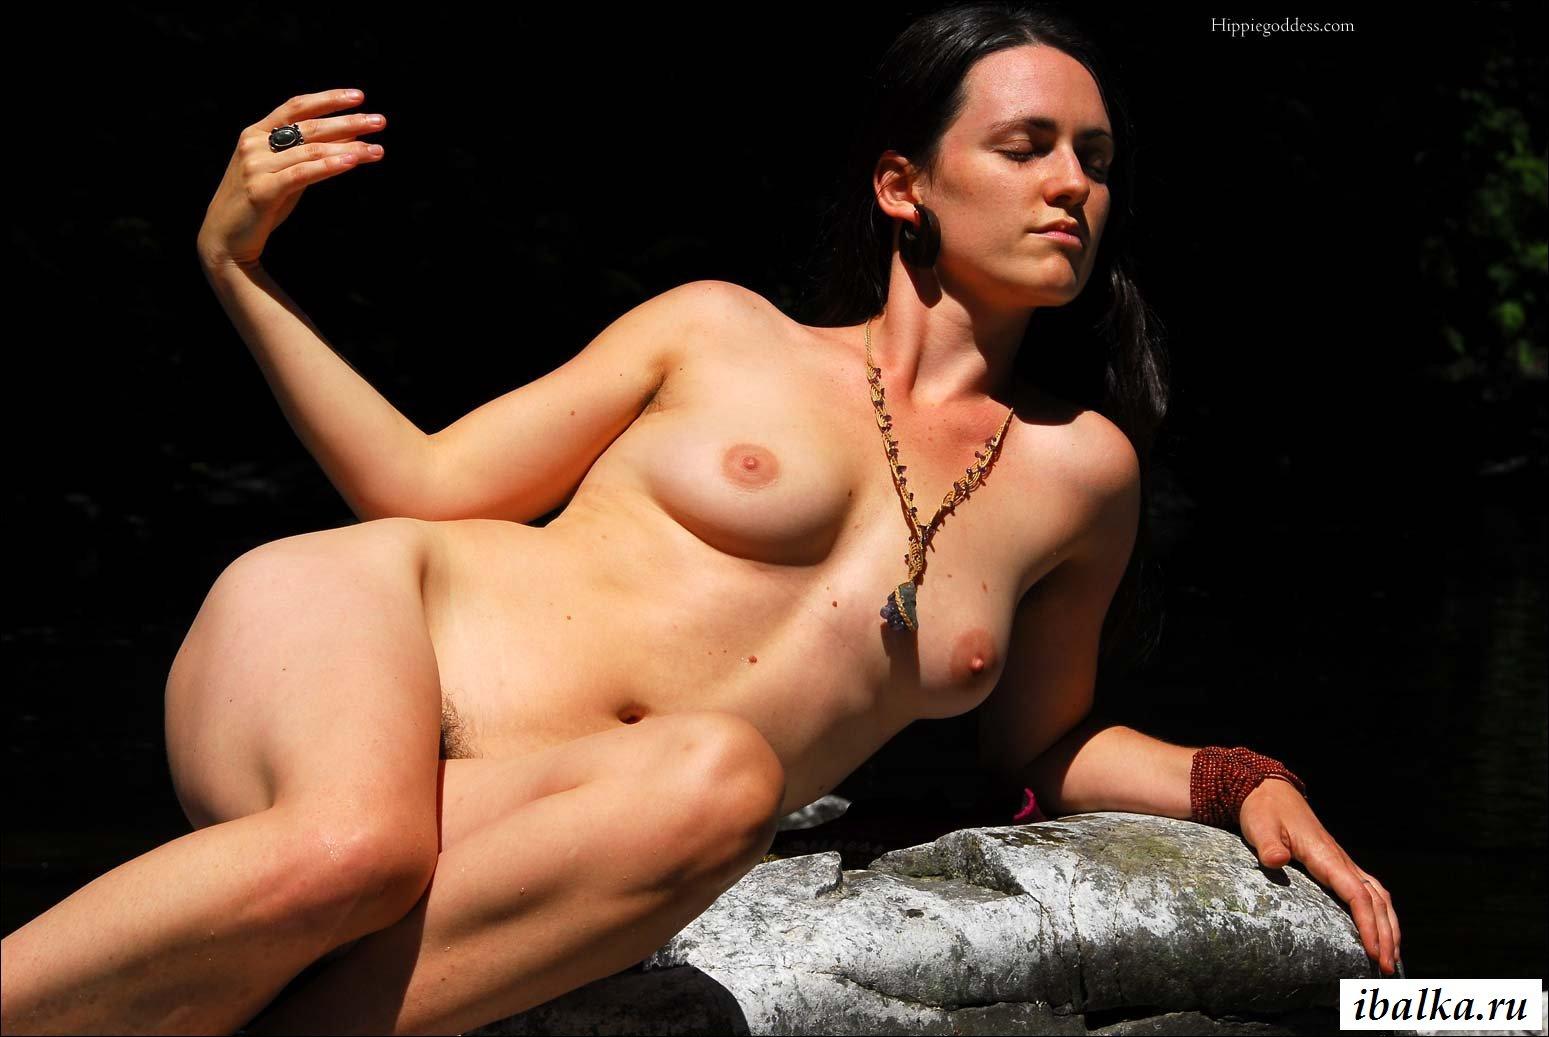 foto-golie-slavi-porno-virt-forum